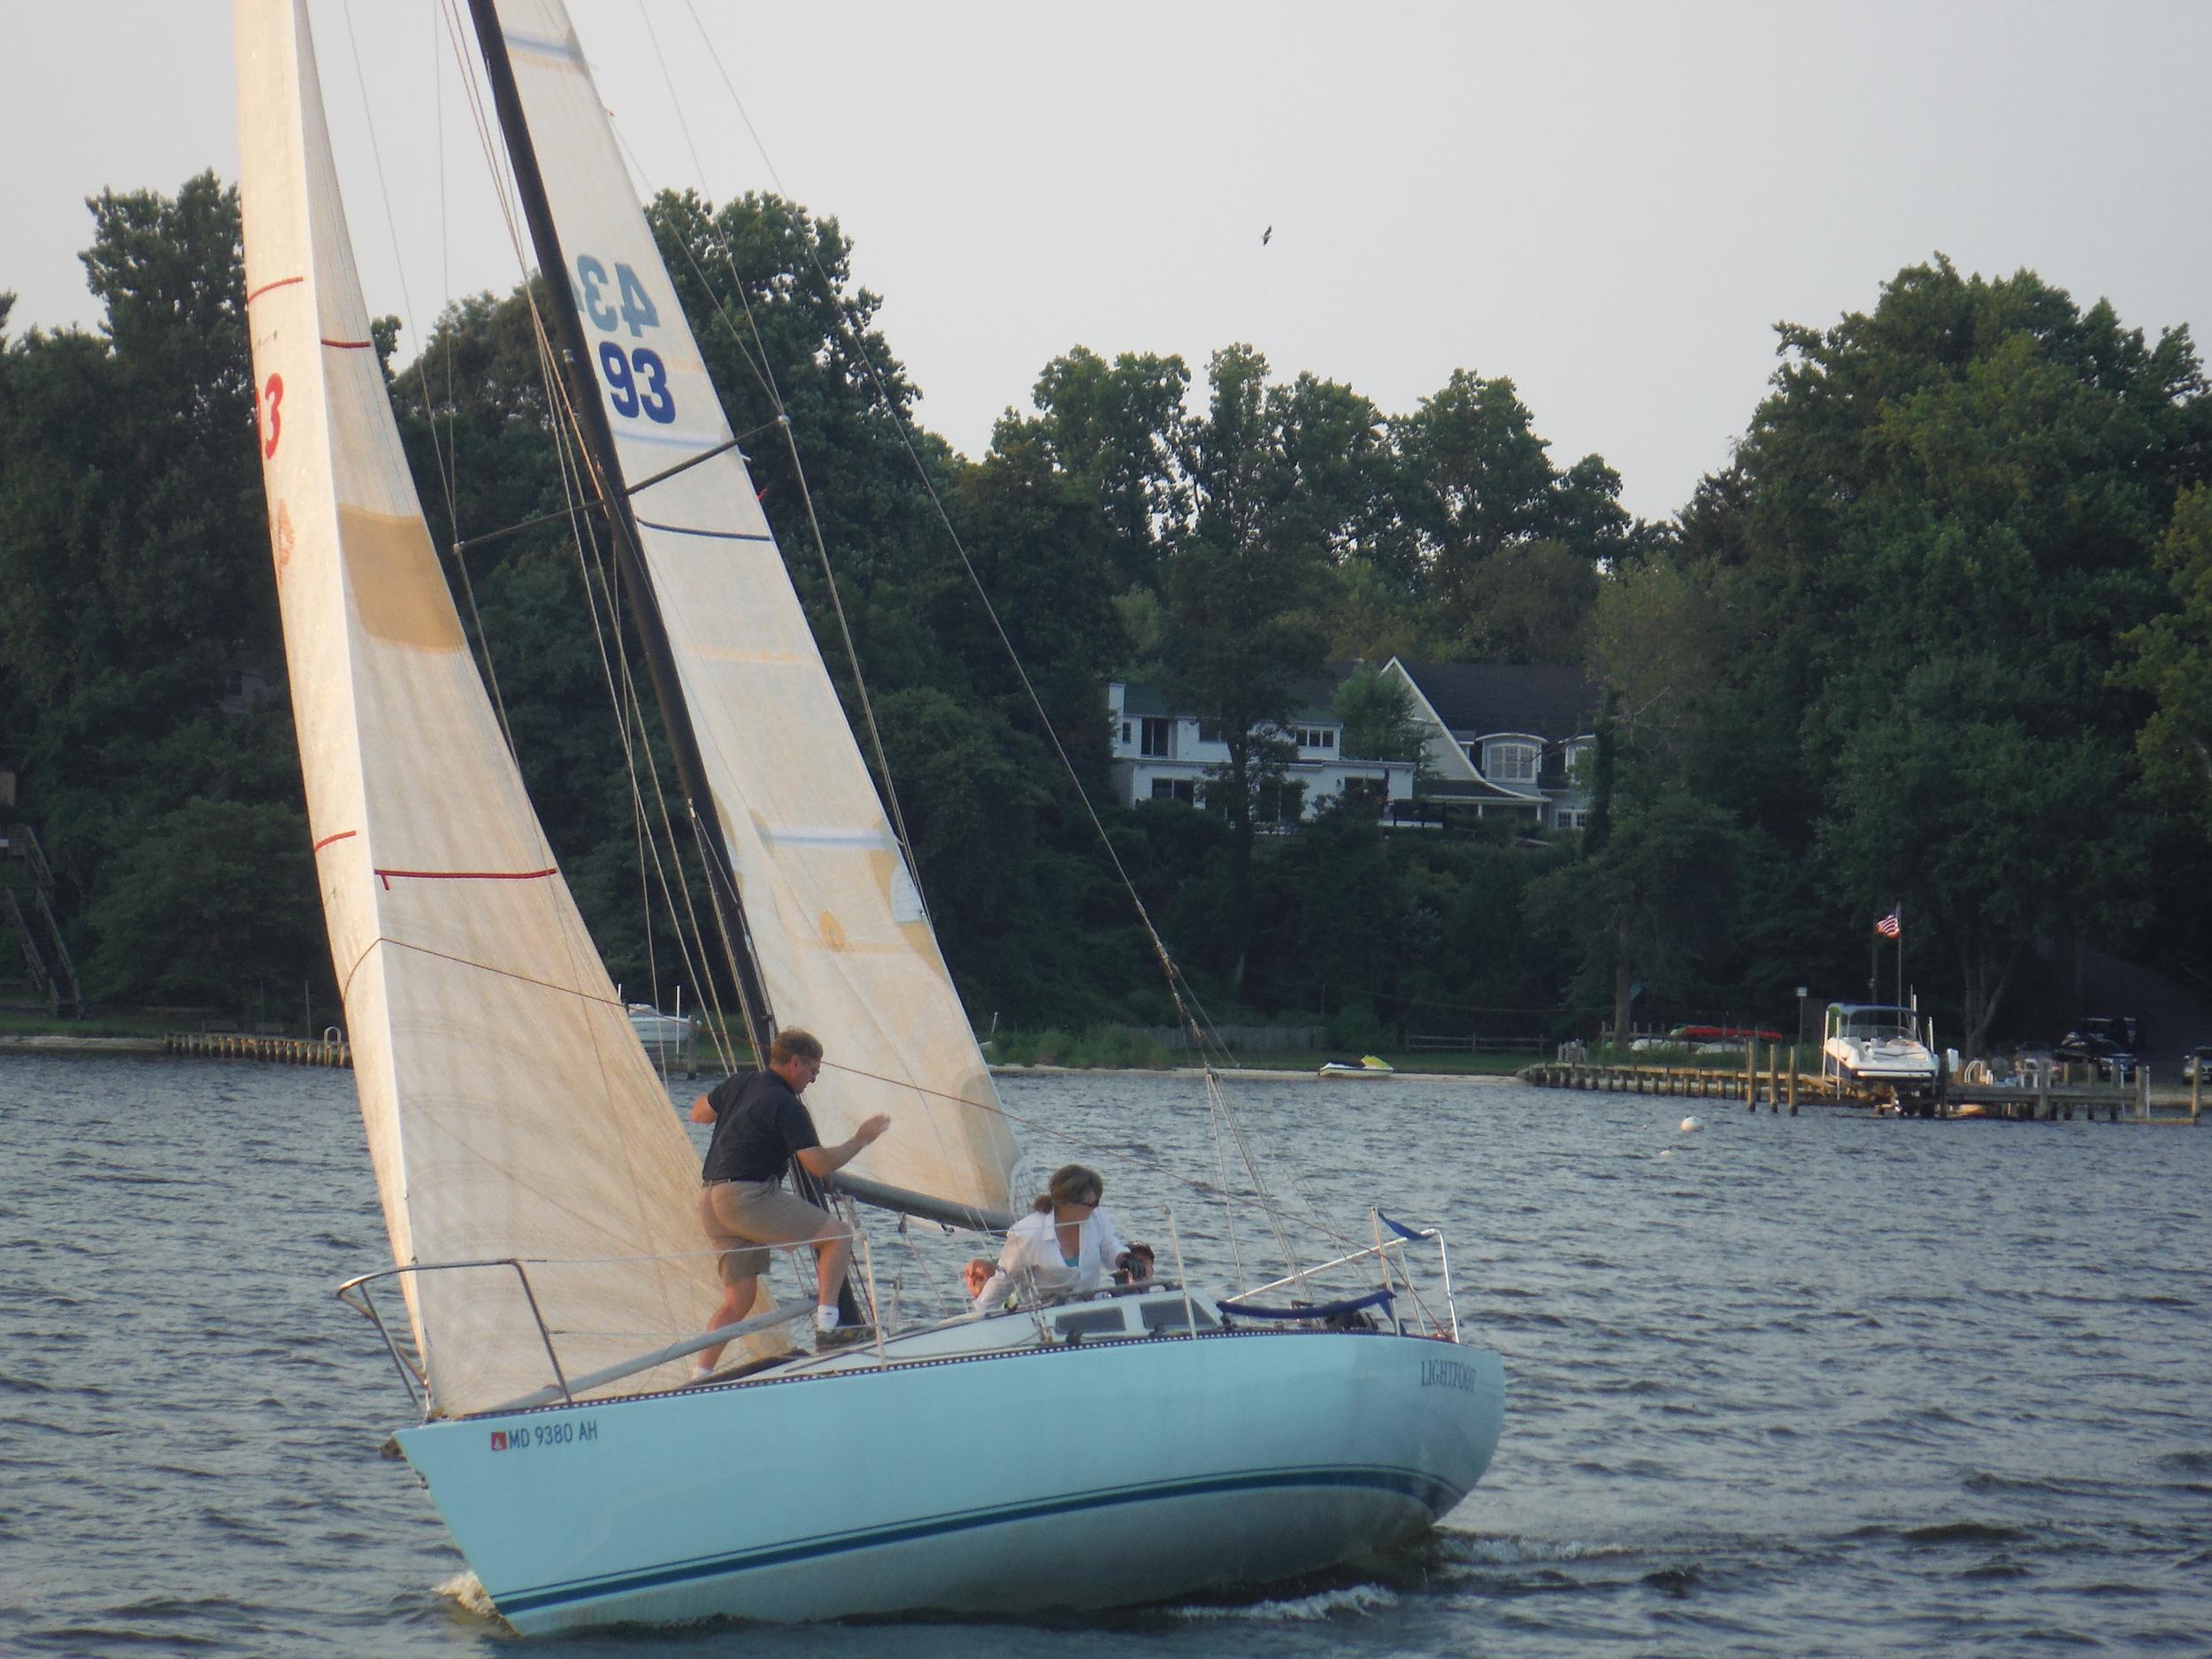 7-30-14 Race Commitee Photos 101.JPG